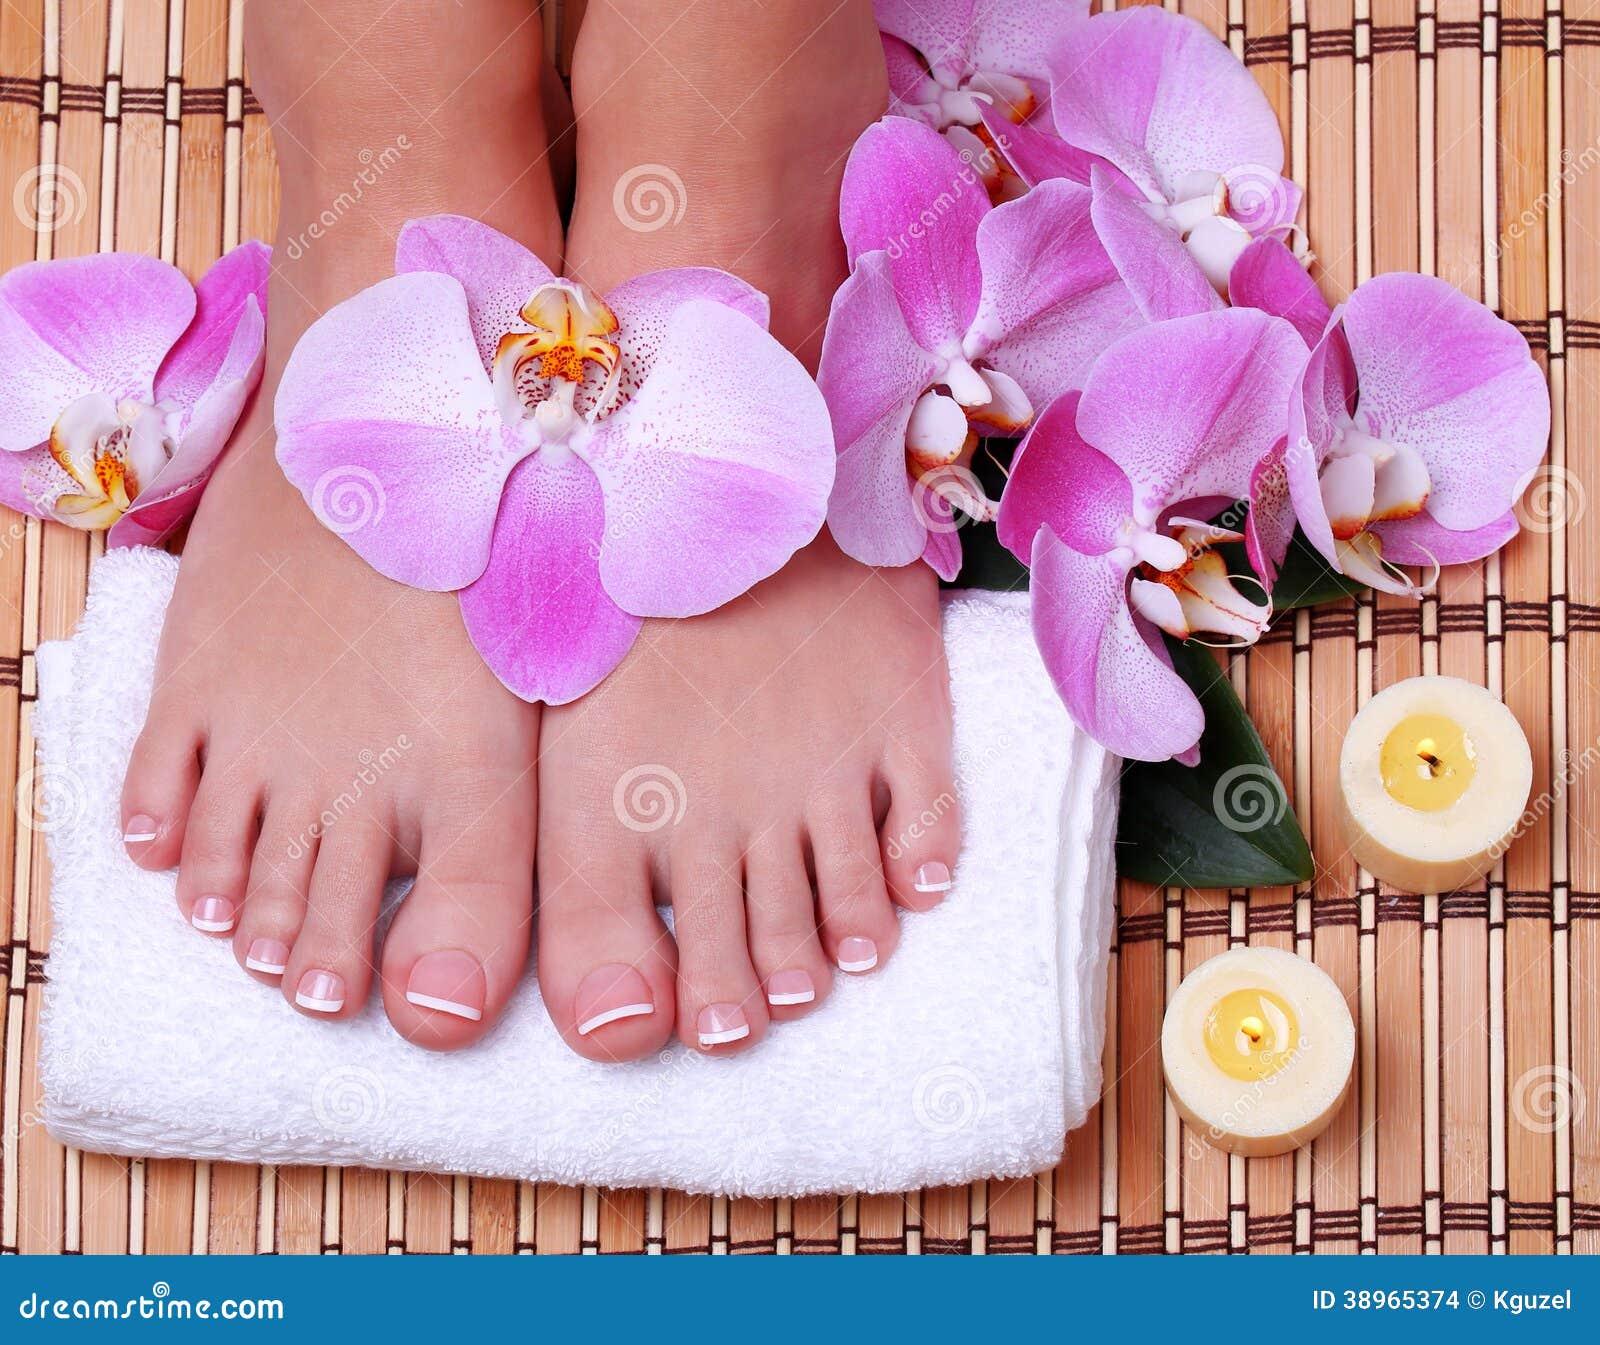 Pedicure. Mooie voeten met Franse manicure